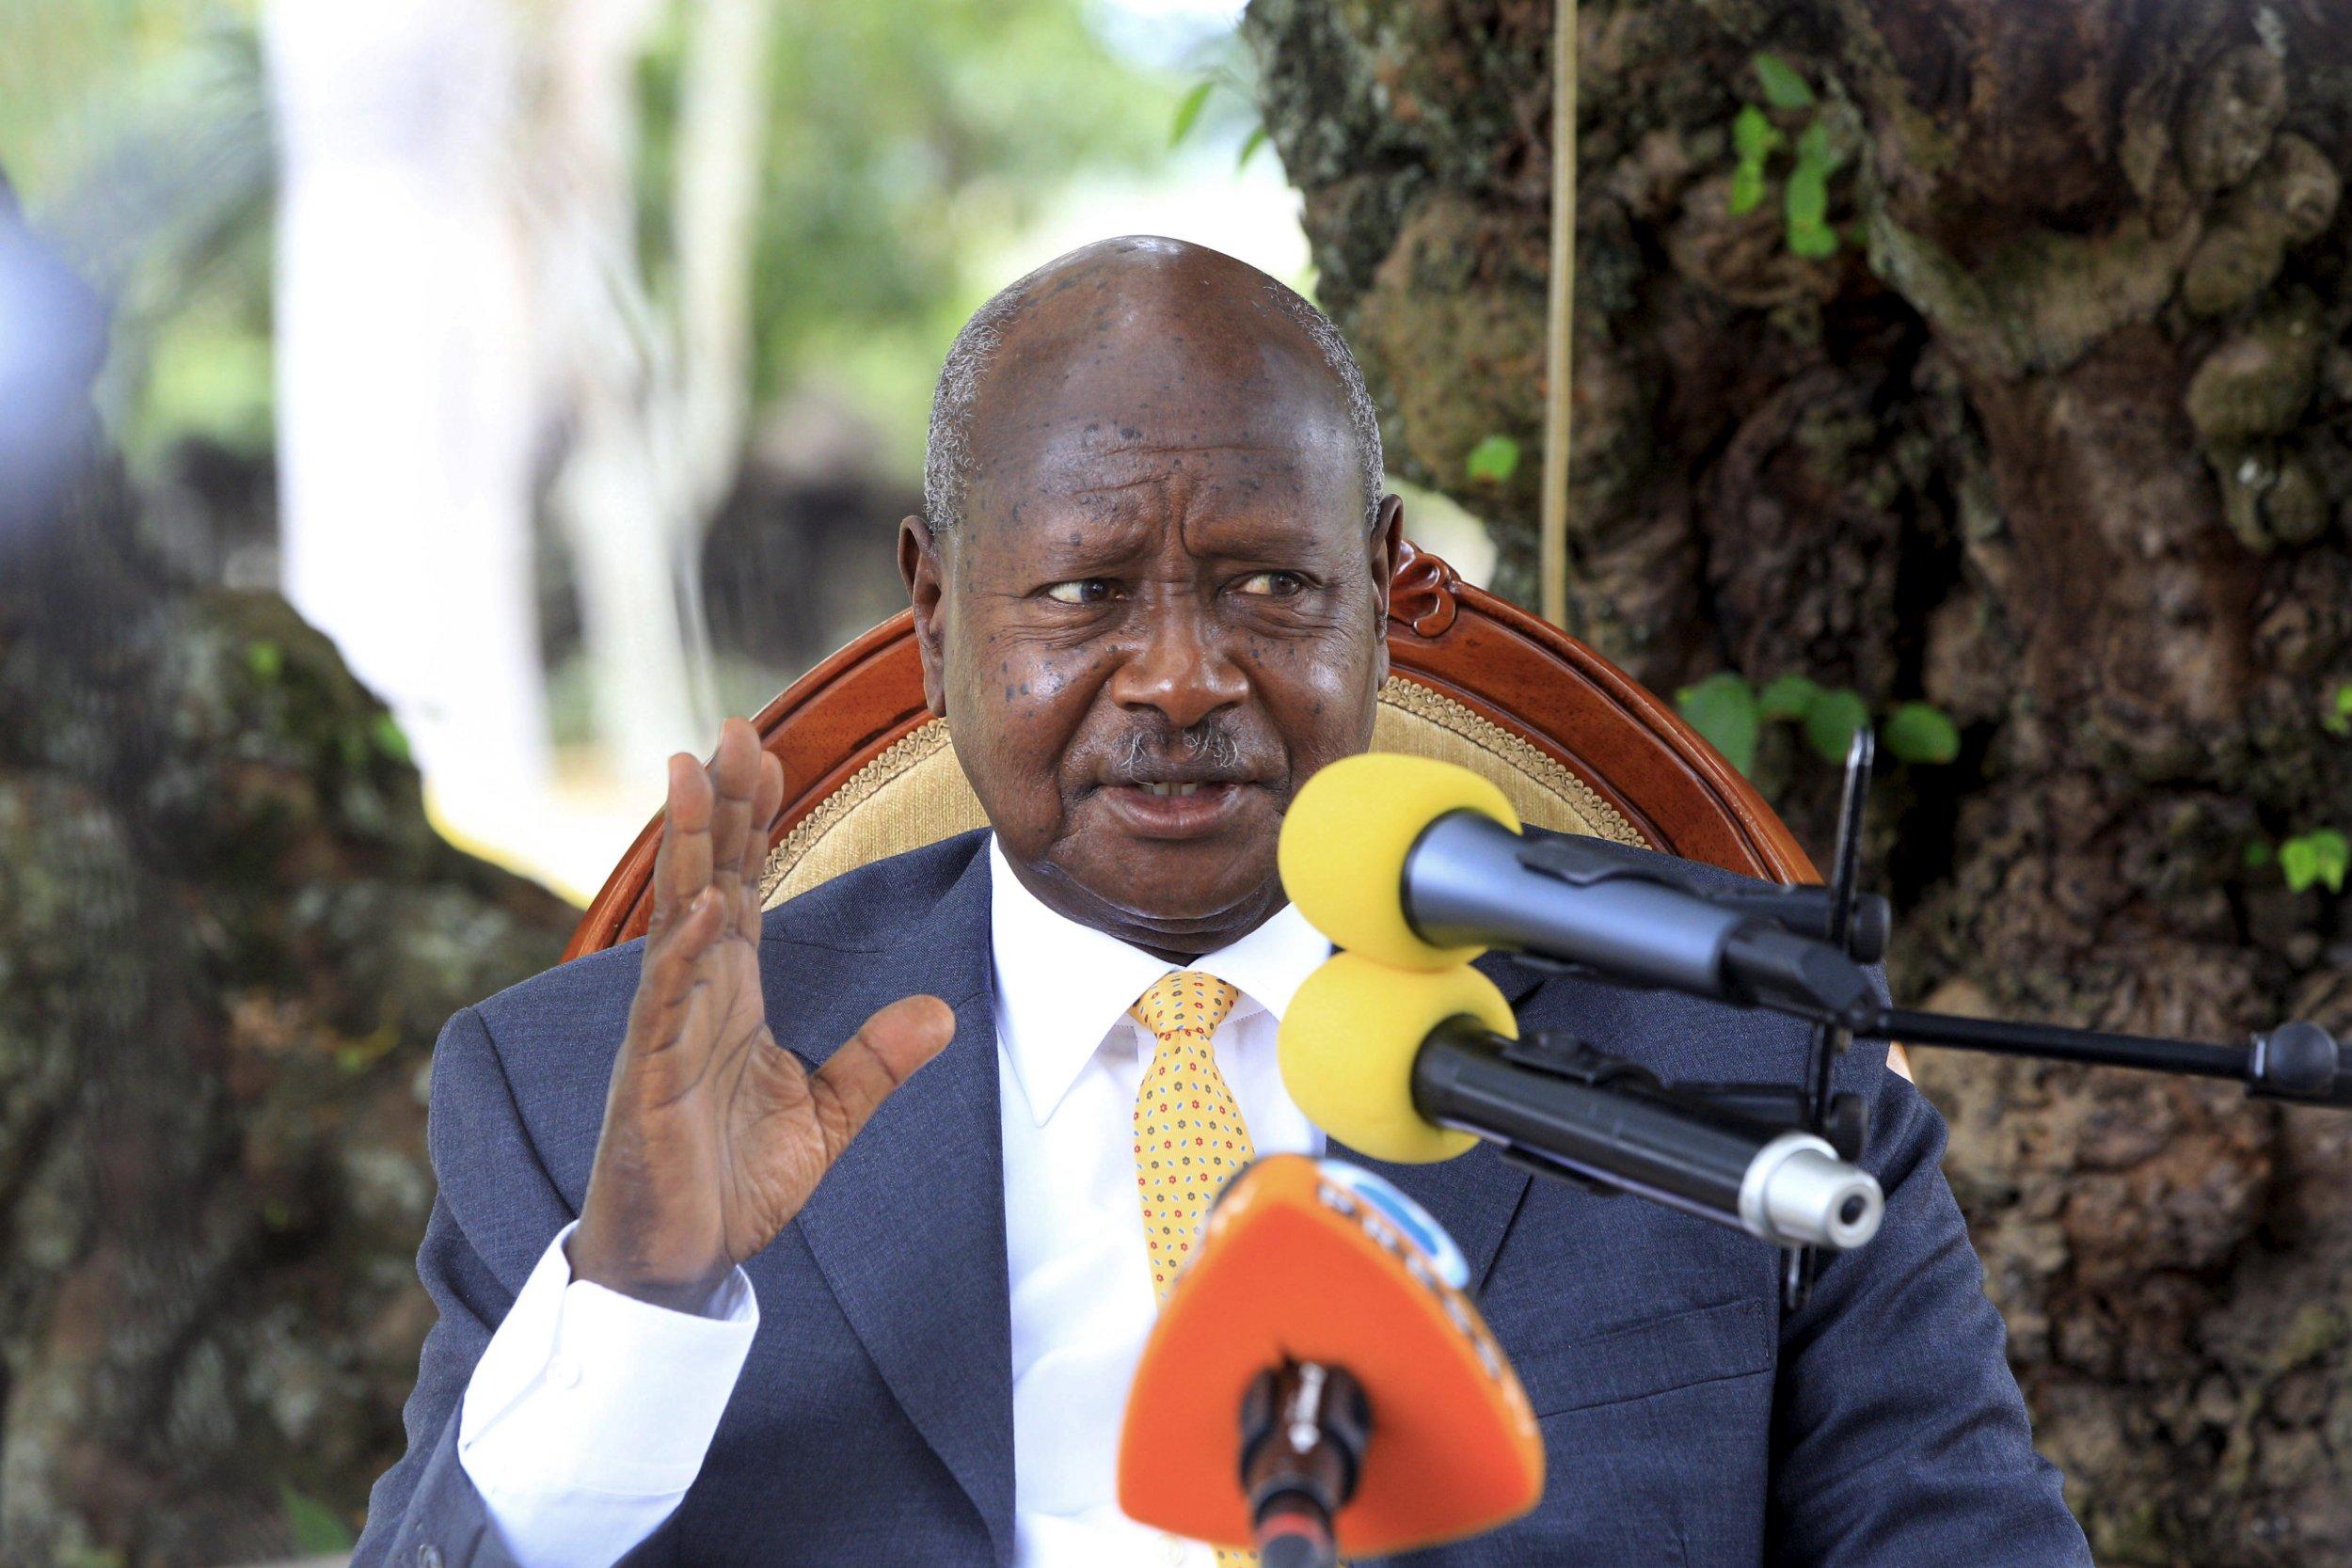 Uganda's president Yoweri Museveni addresses the nation.